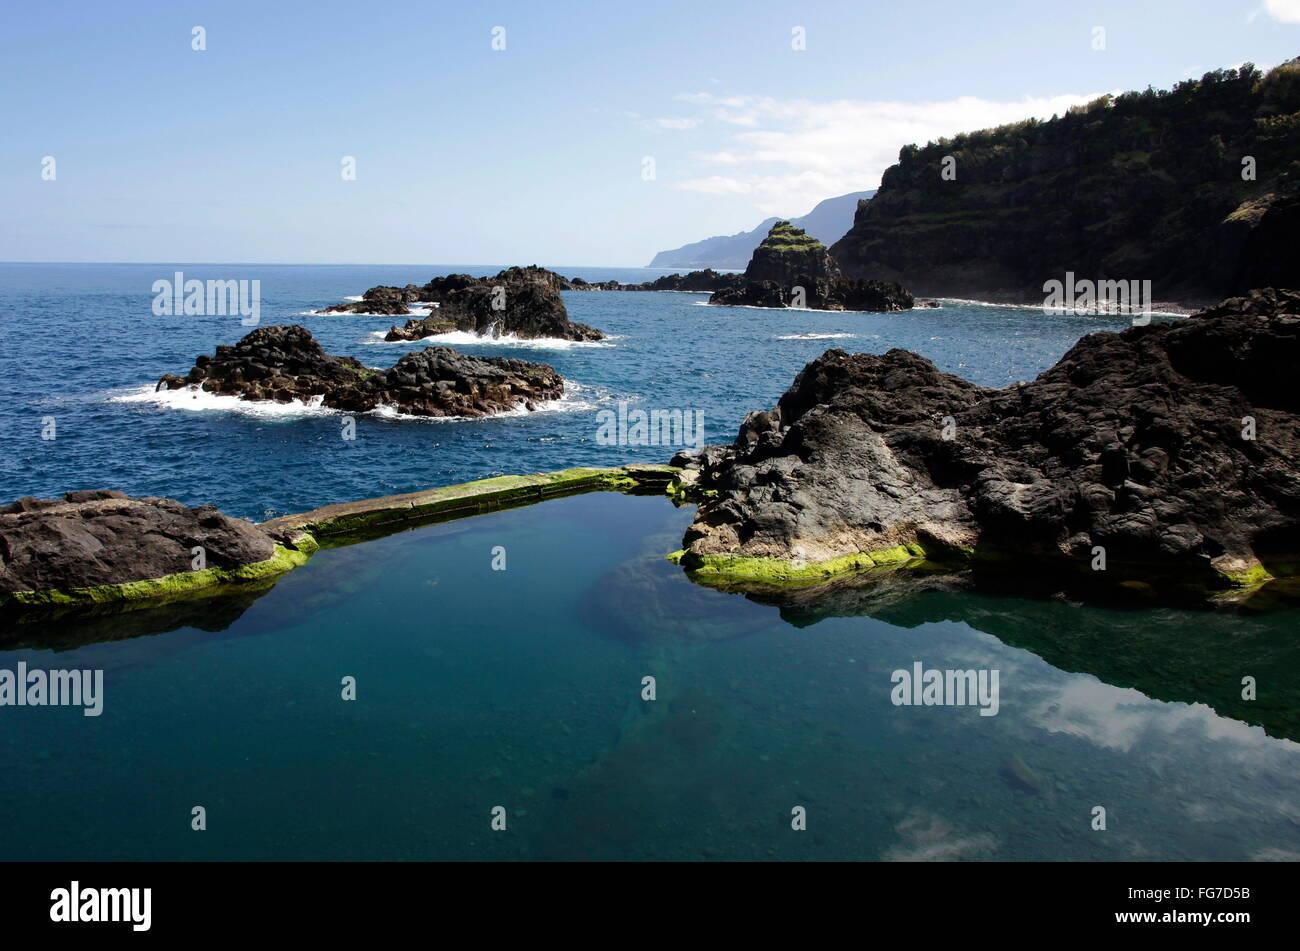 Géographie / voyage, Portugal, Madère, Seixal, nature piscine, Océan Atlantique,-Additional-Rights Clearance-Info Banque D'Images